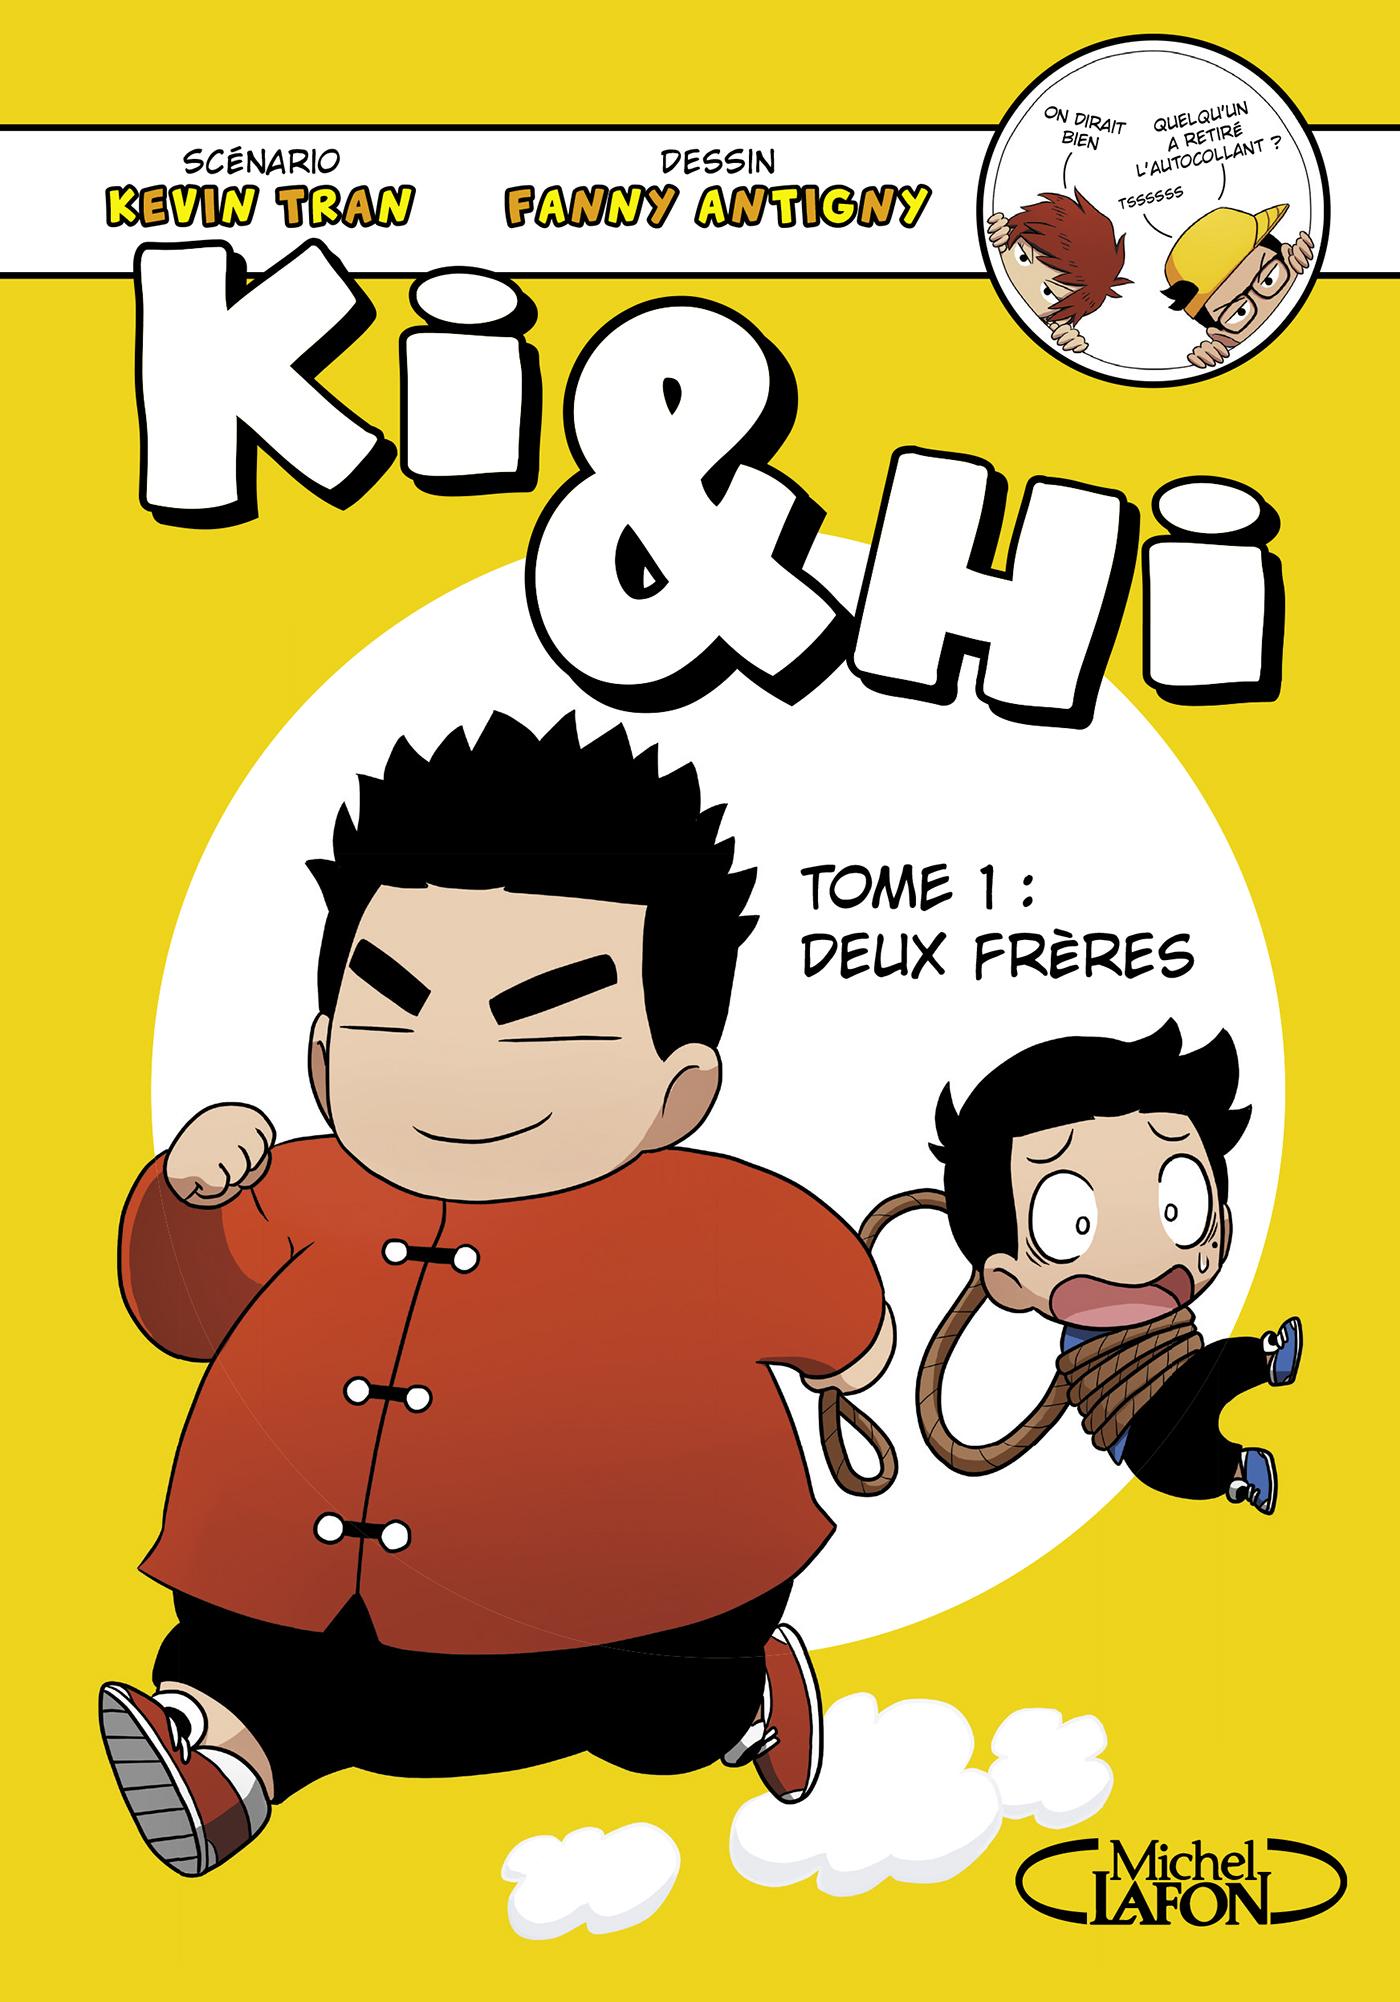 Ki & Hi – Tome 1 : Deux frères